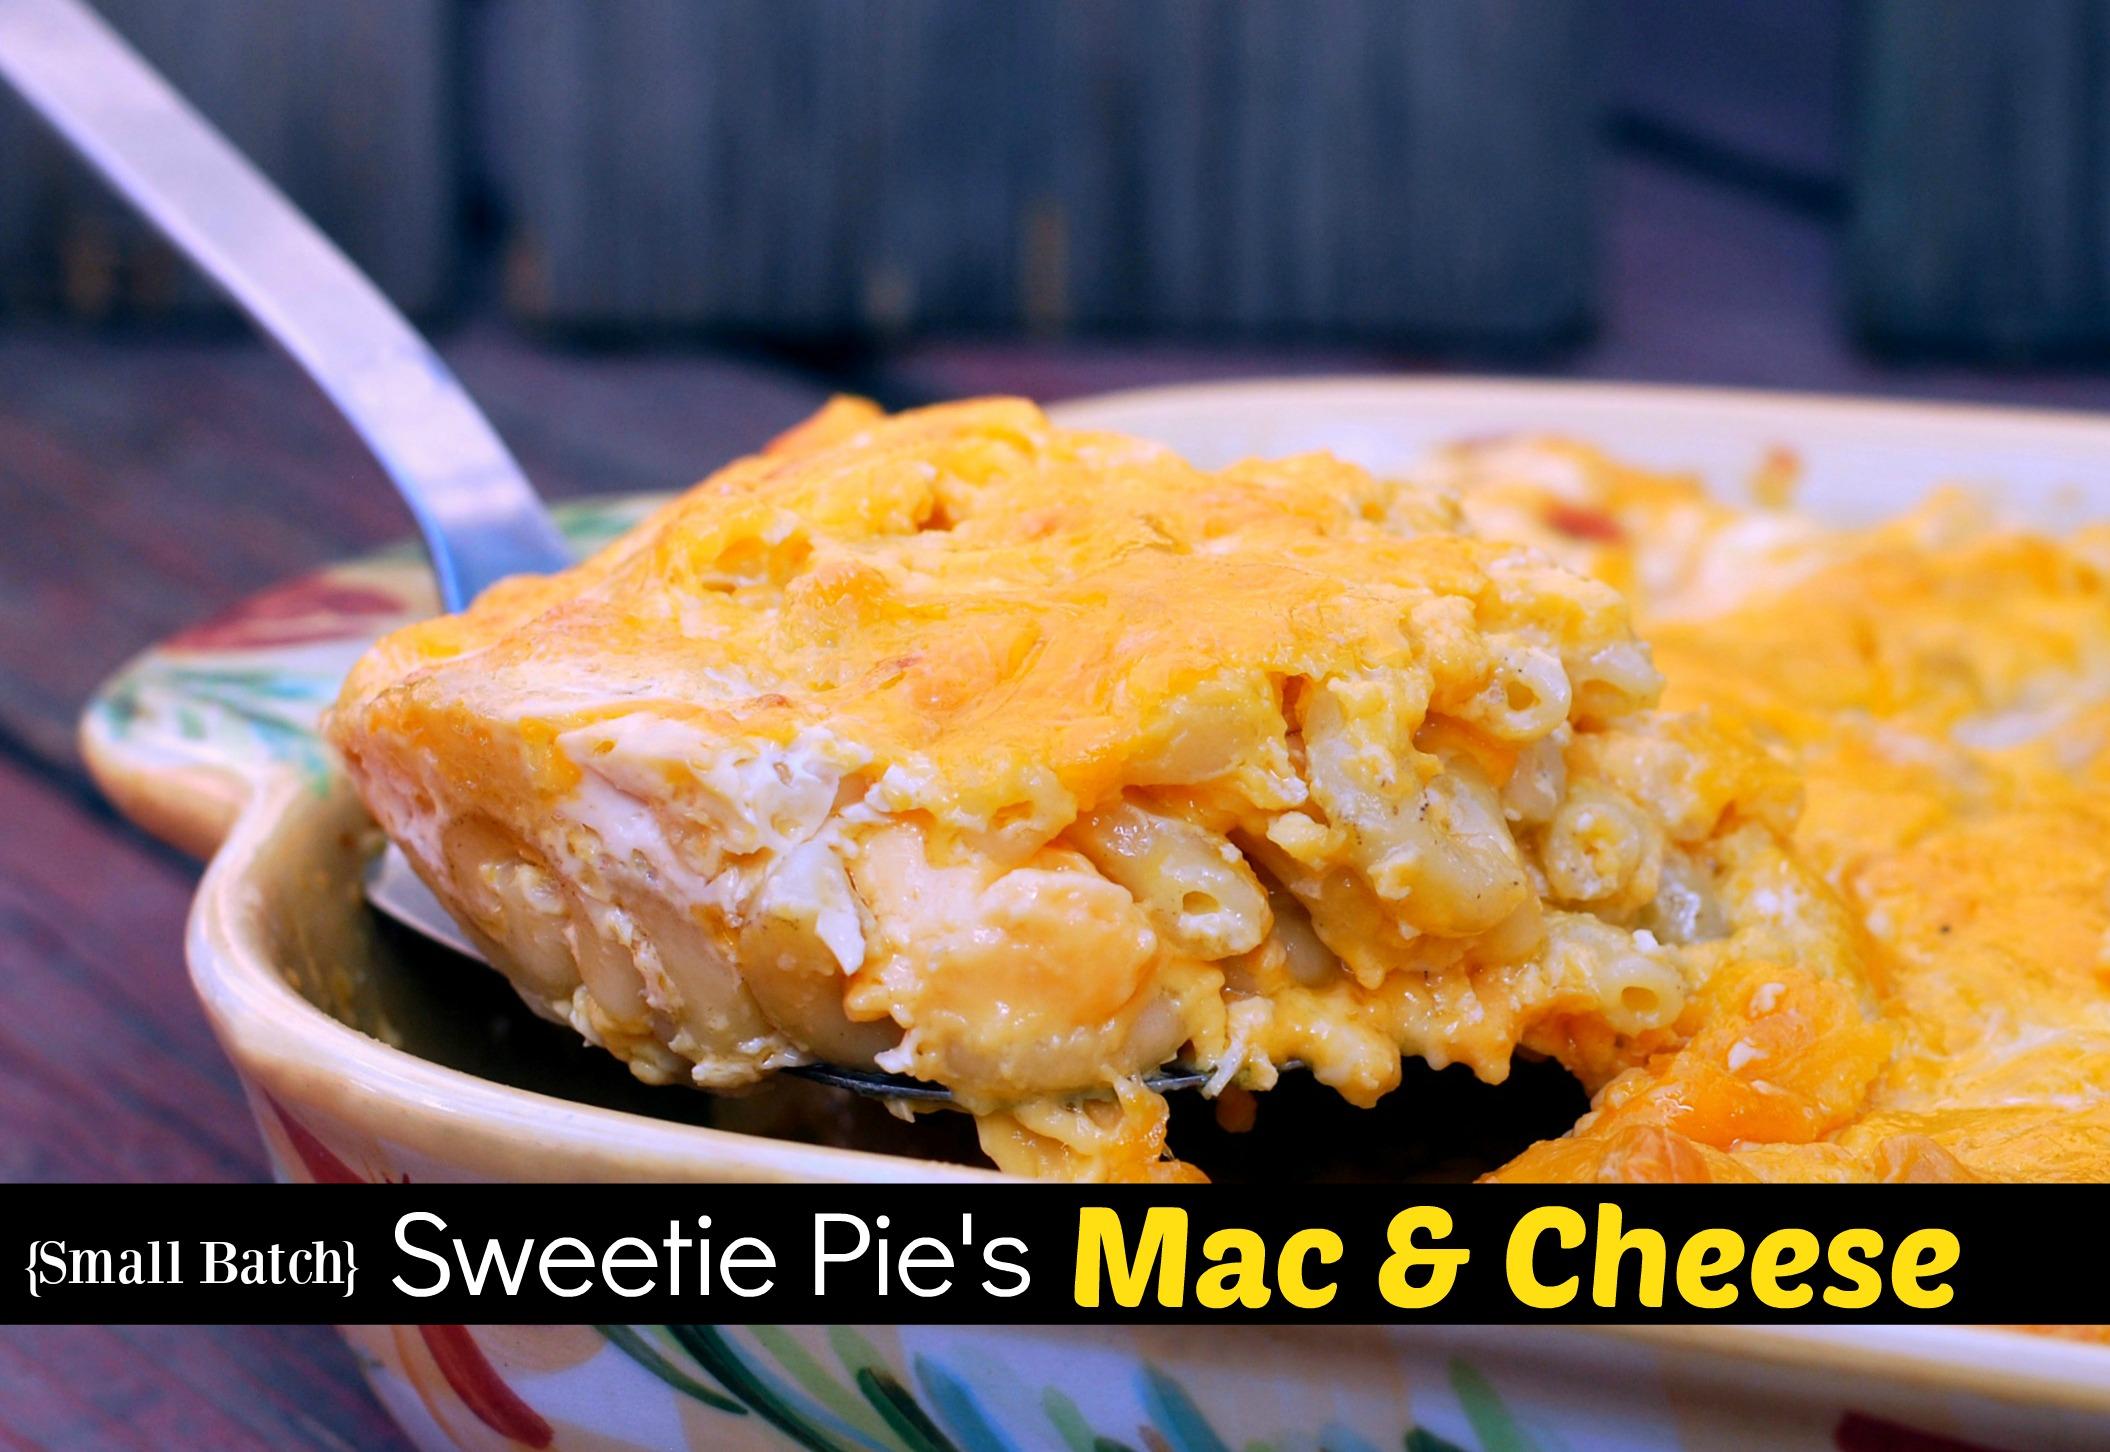 sweeties pies mac and cheese